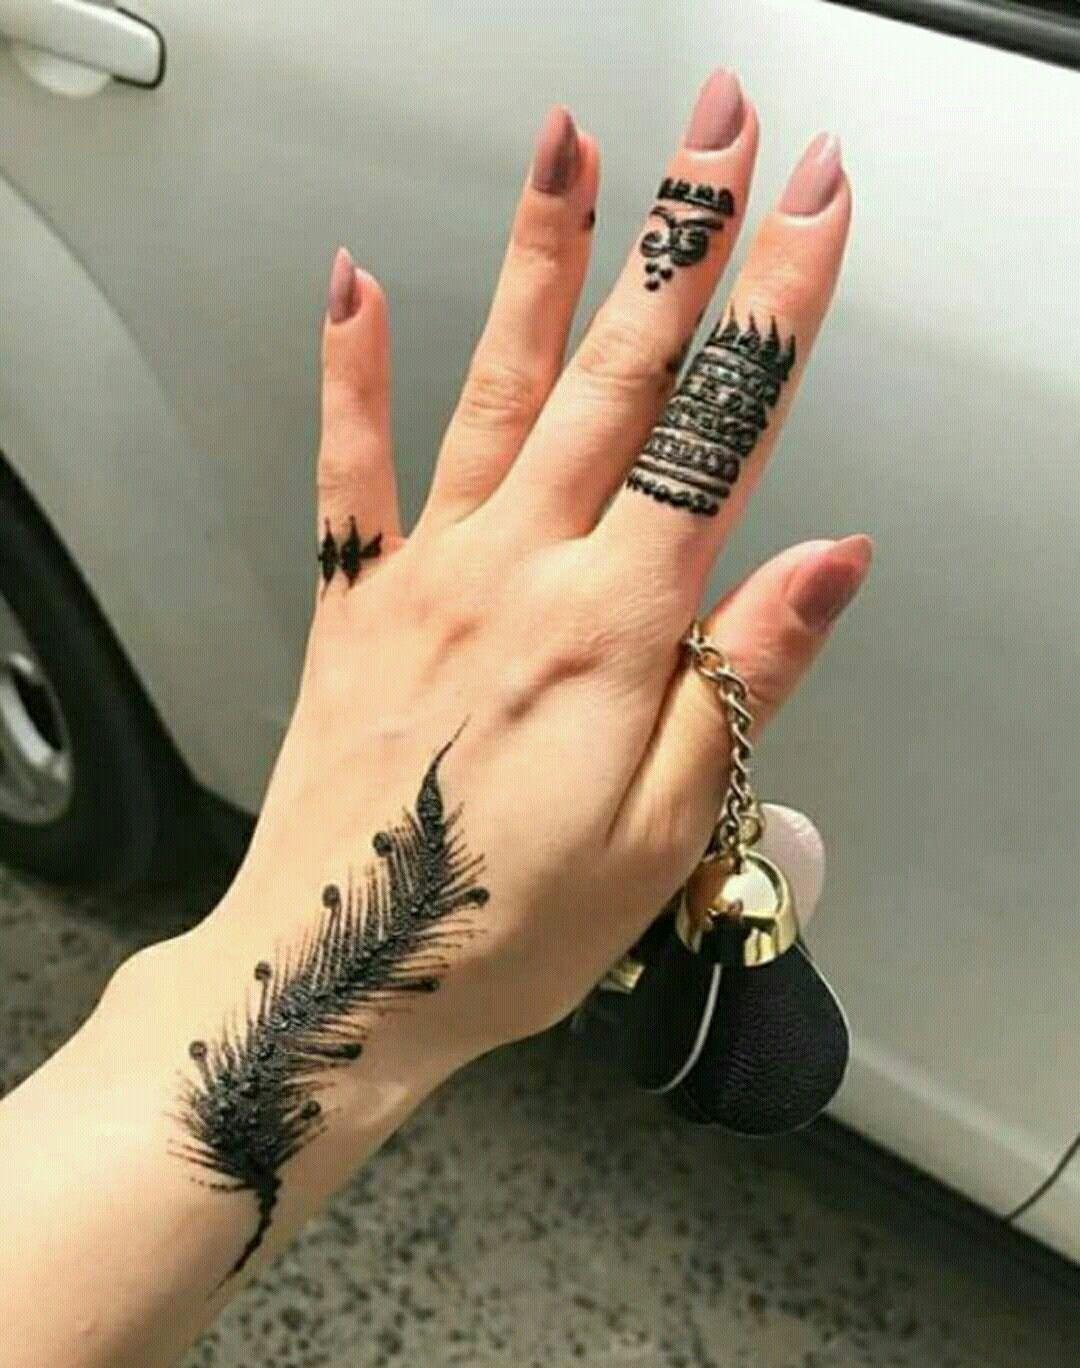 نقش حنا Henna Tattoo Designs Unique Mehndi Designs Henna Designs